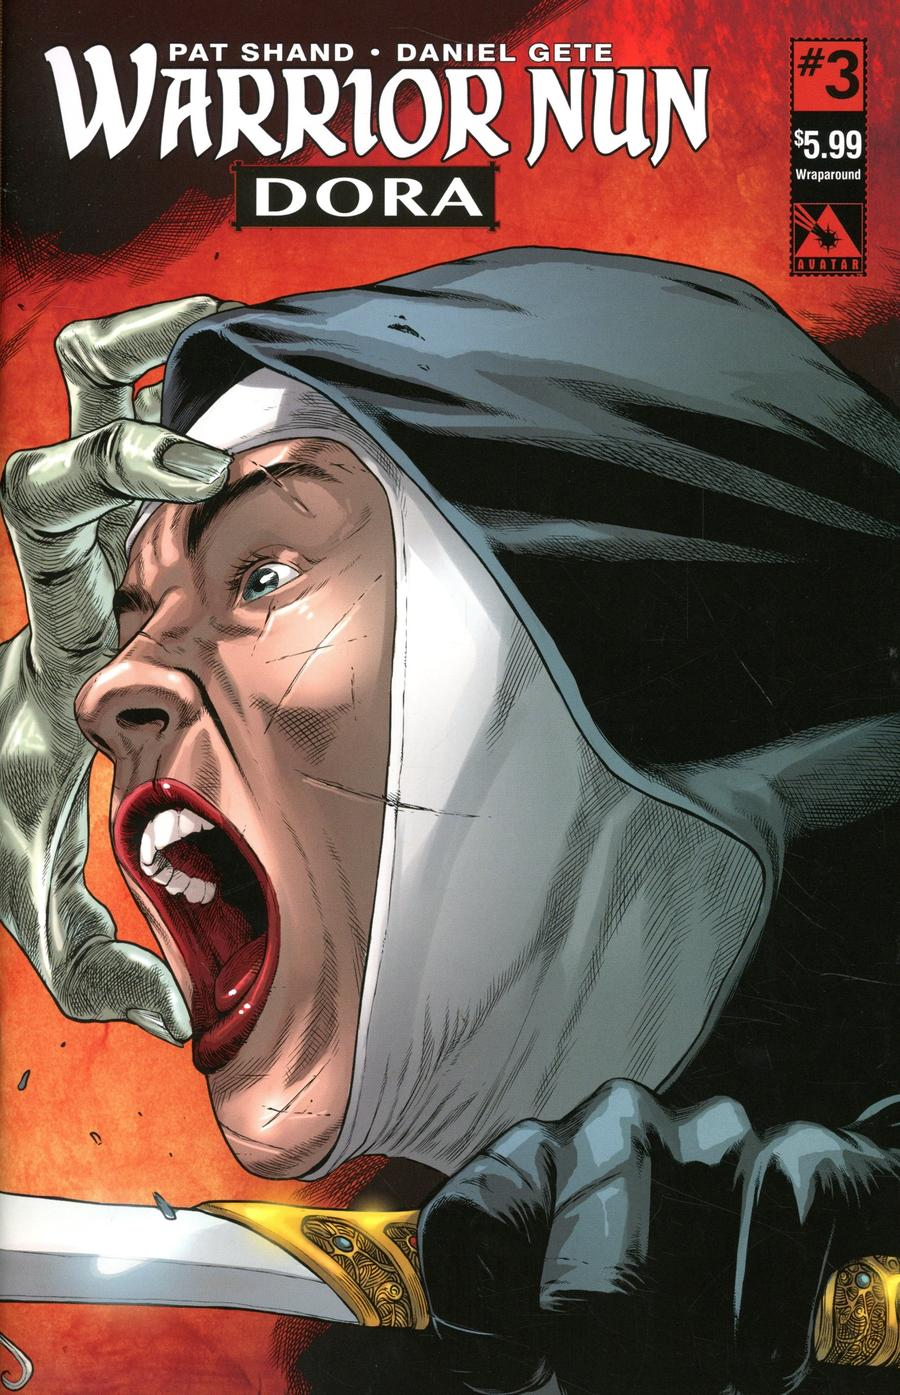 Warrior Nun Dora #3 Cover B Wraparound Cover